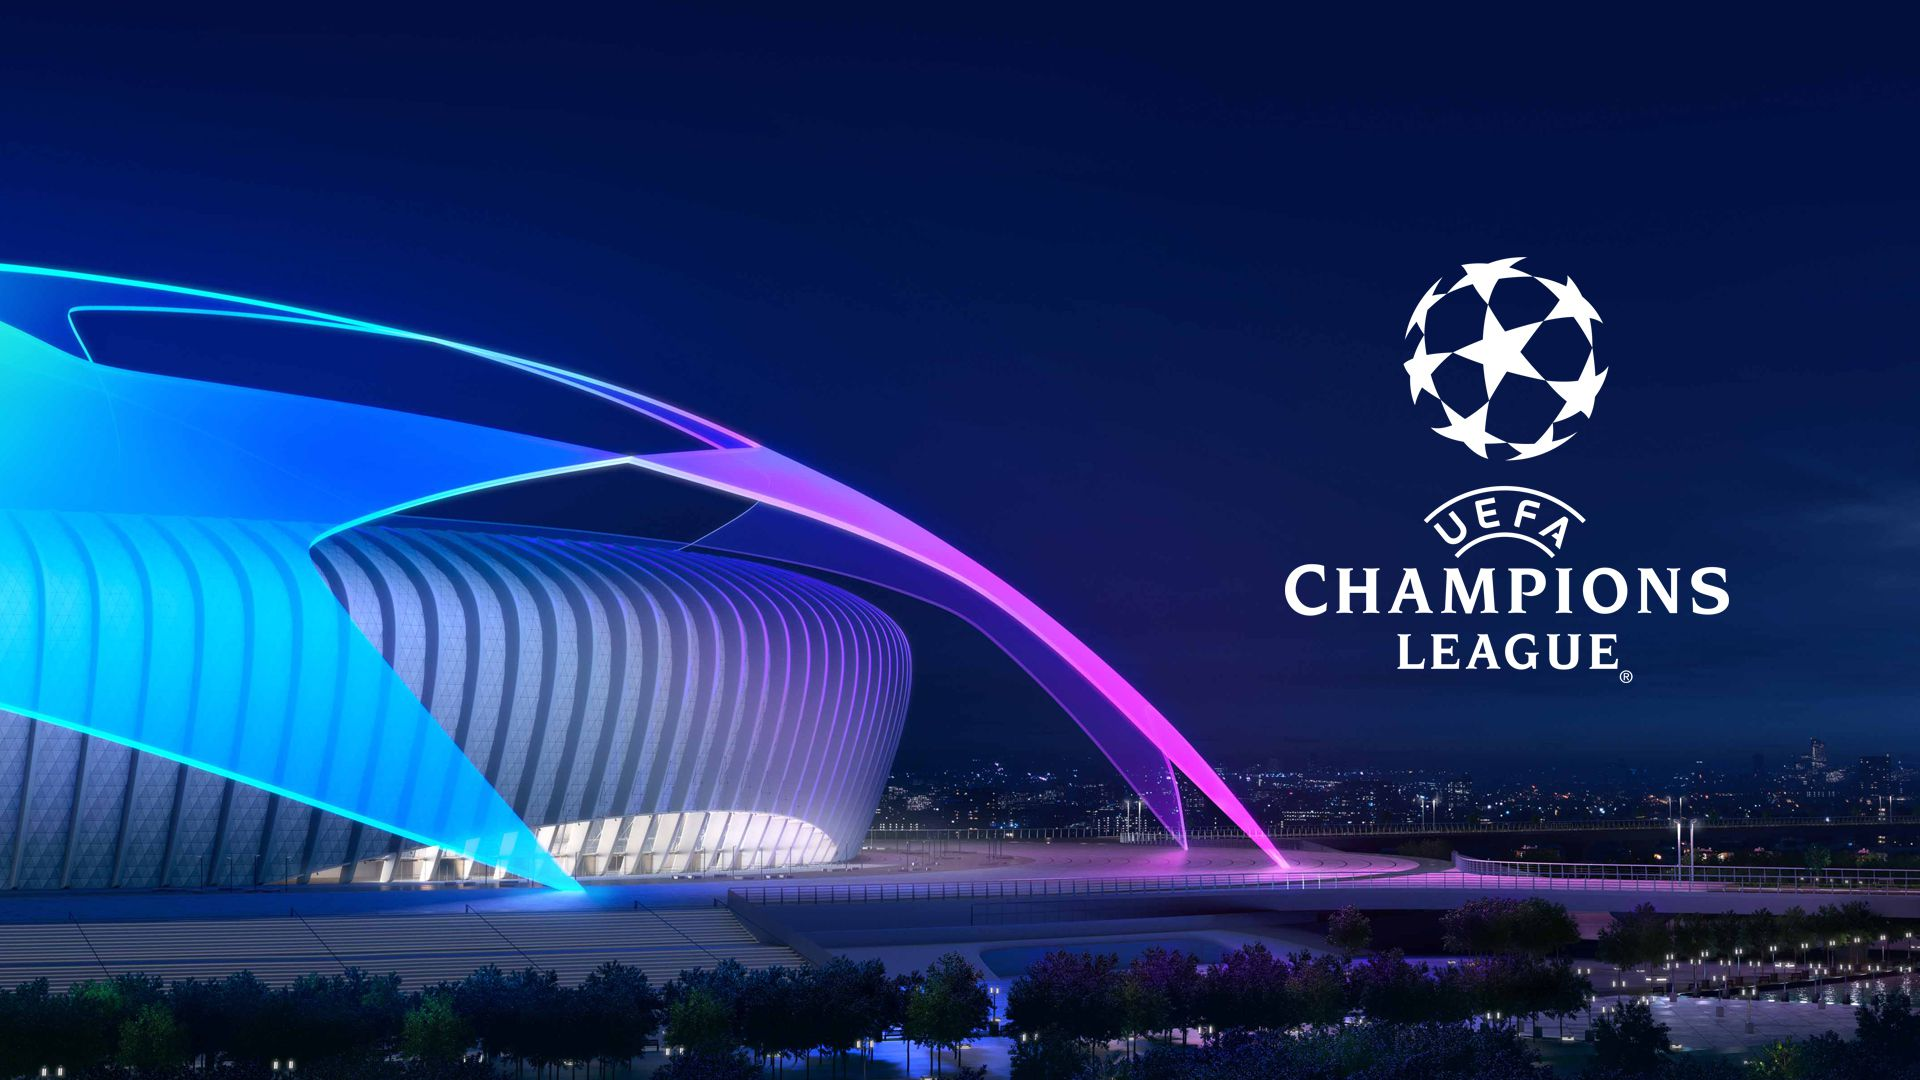 Calendario Europa League Ottavi.Champions League Calendario Ottavi Di Finale In Diretta Su